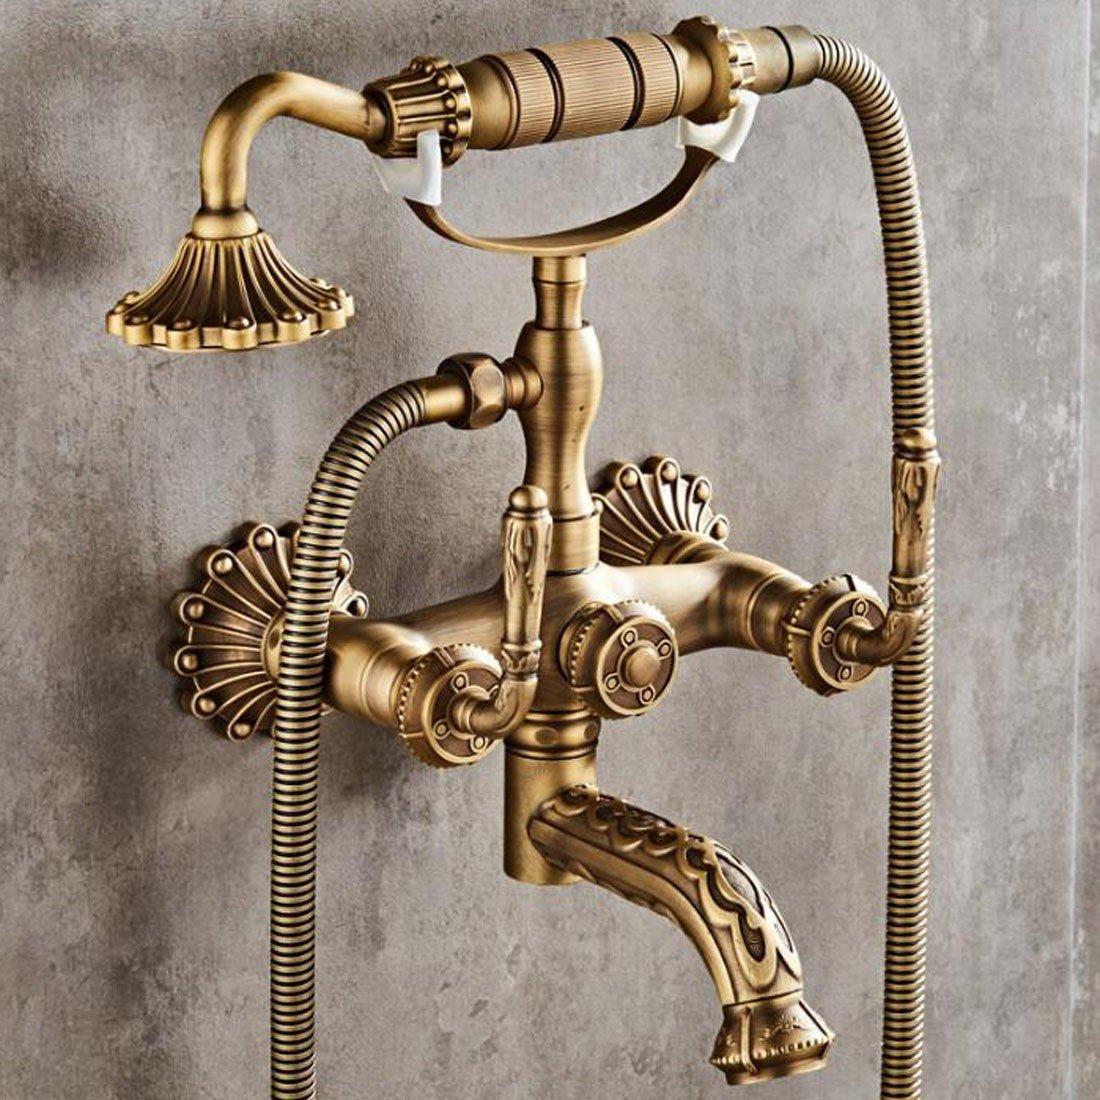 B SJQKA shower set Antique Copper Simple Shower Set Home Wall Hanging Nozzle Hand Washing Bath European Style,B